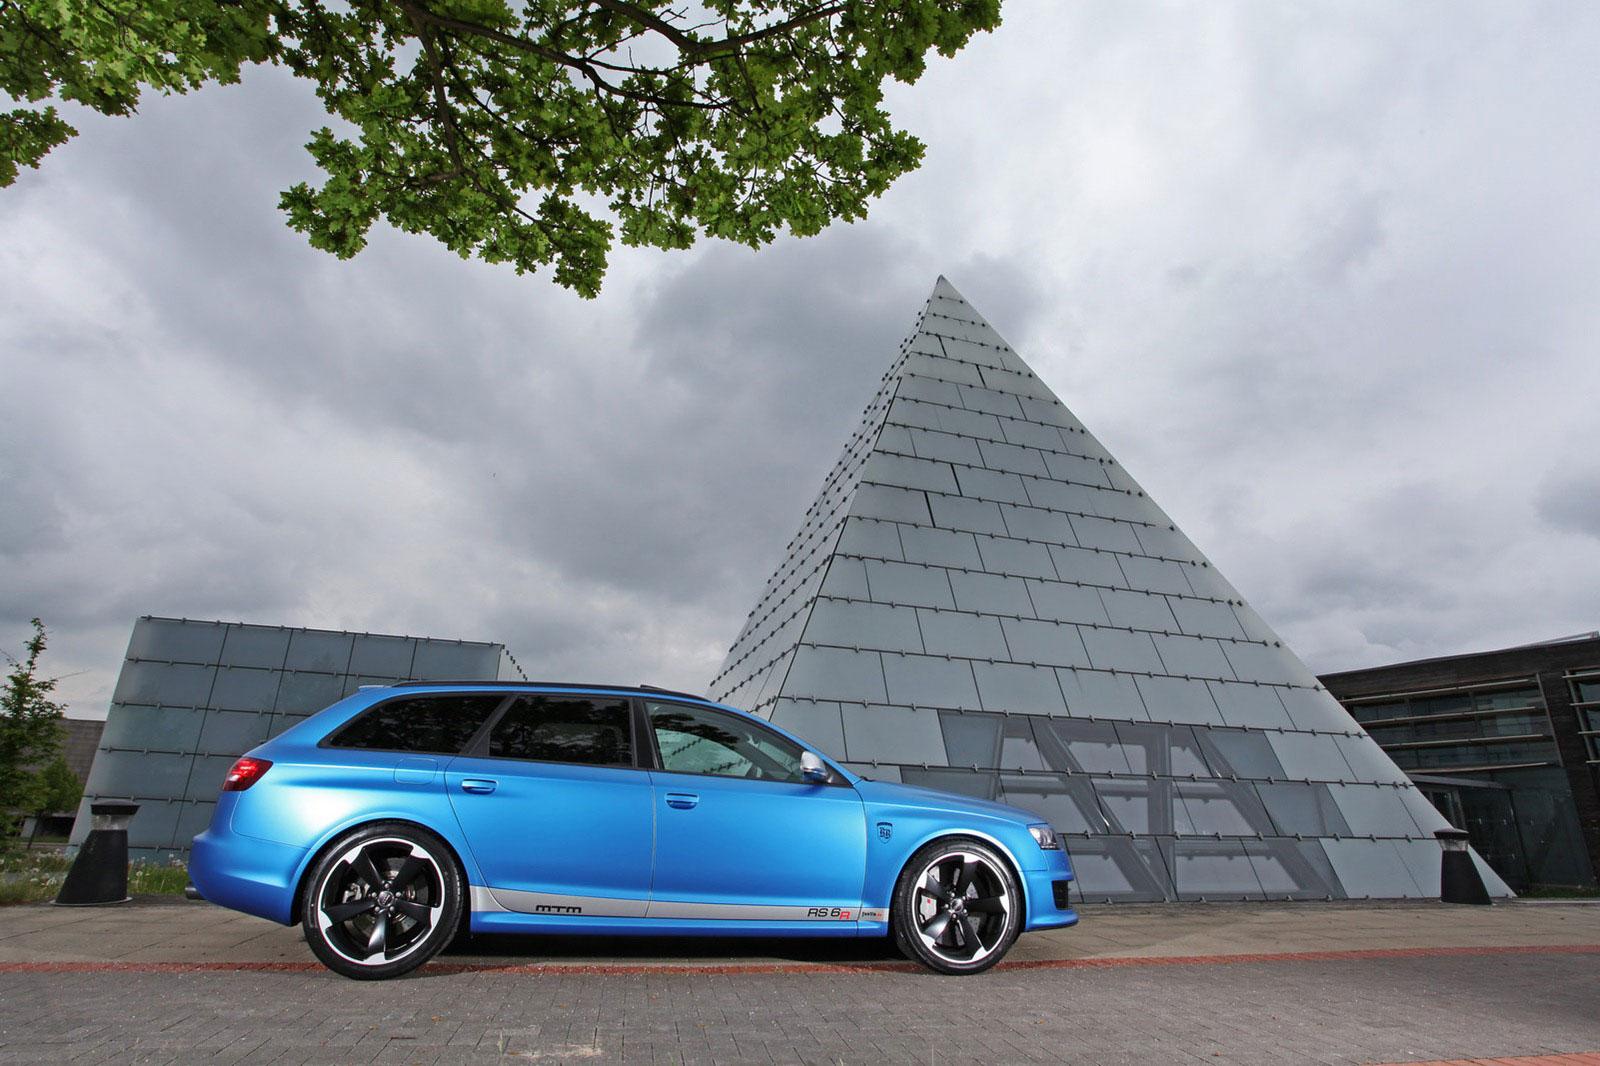 Fostla a MTM vytvořili velmi našlapané Audi RS6 Avant 5